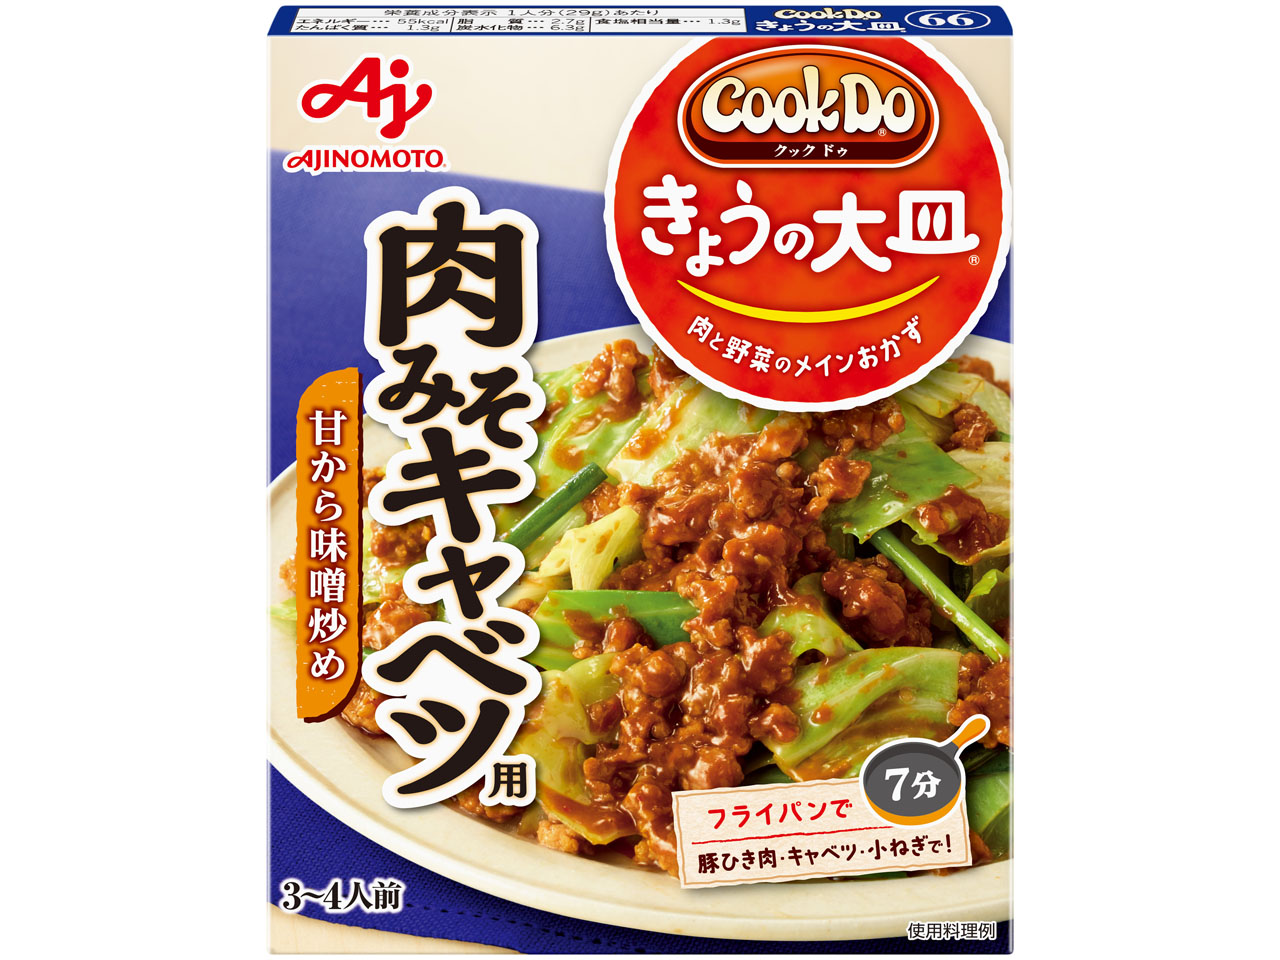 「Cook Doきょうの大皿」肉みそキャベツ用